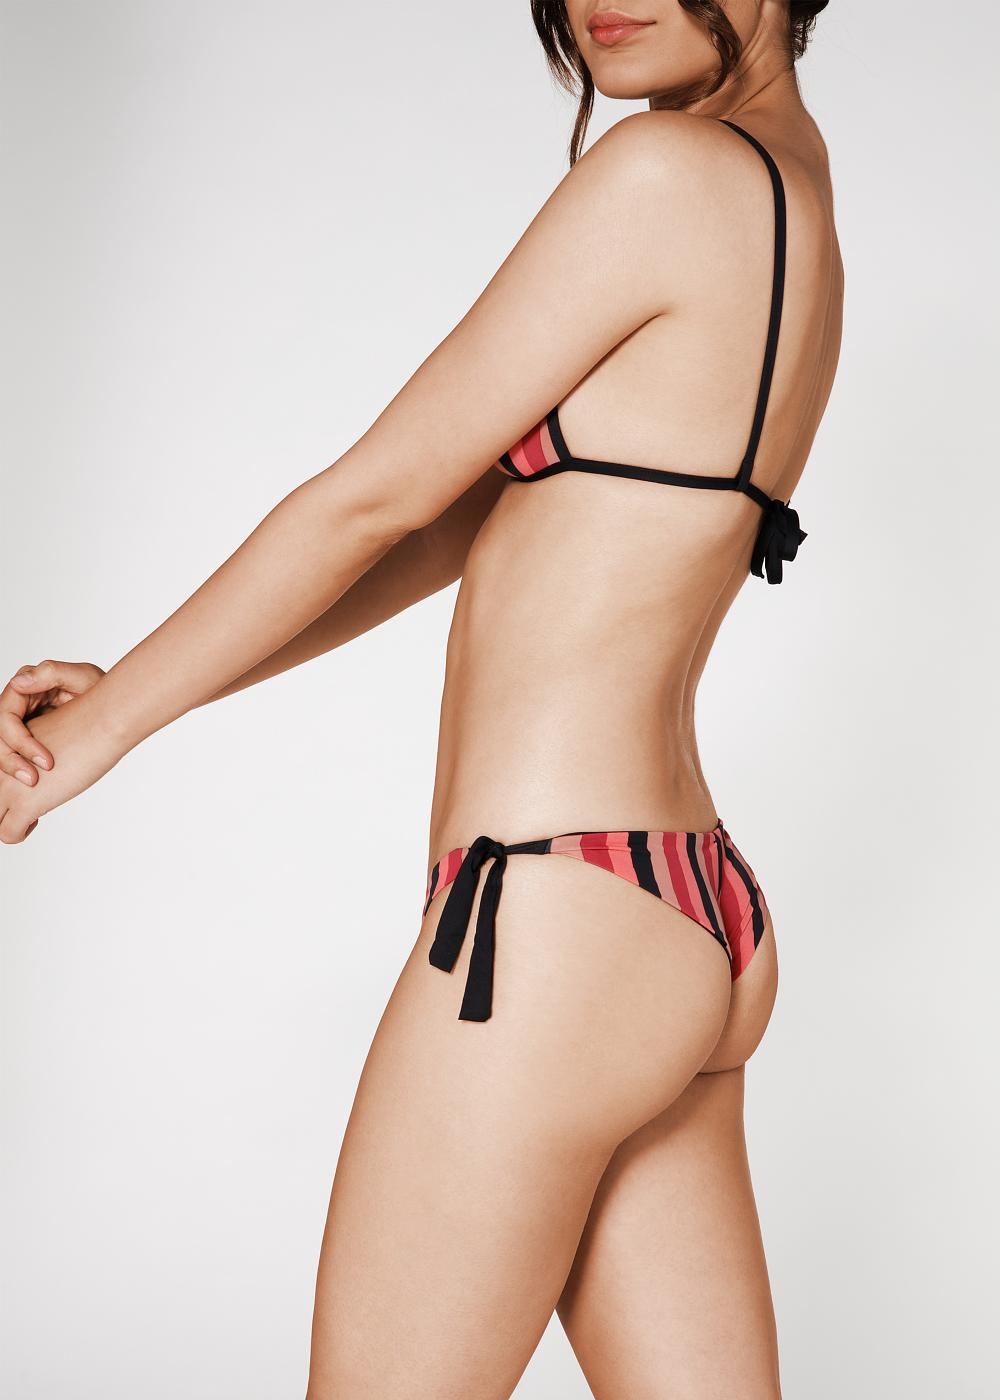 Brazilian Bikinihose Chiara